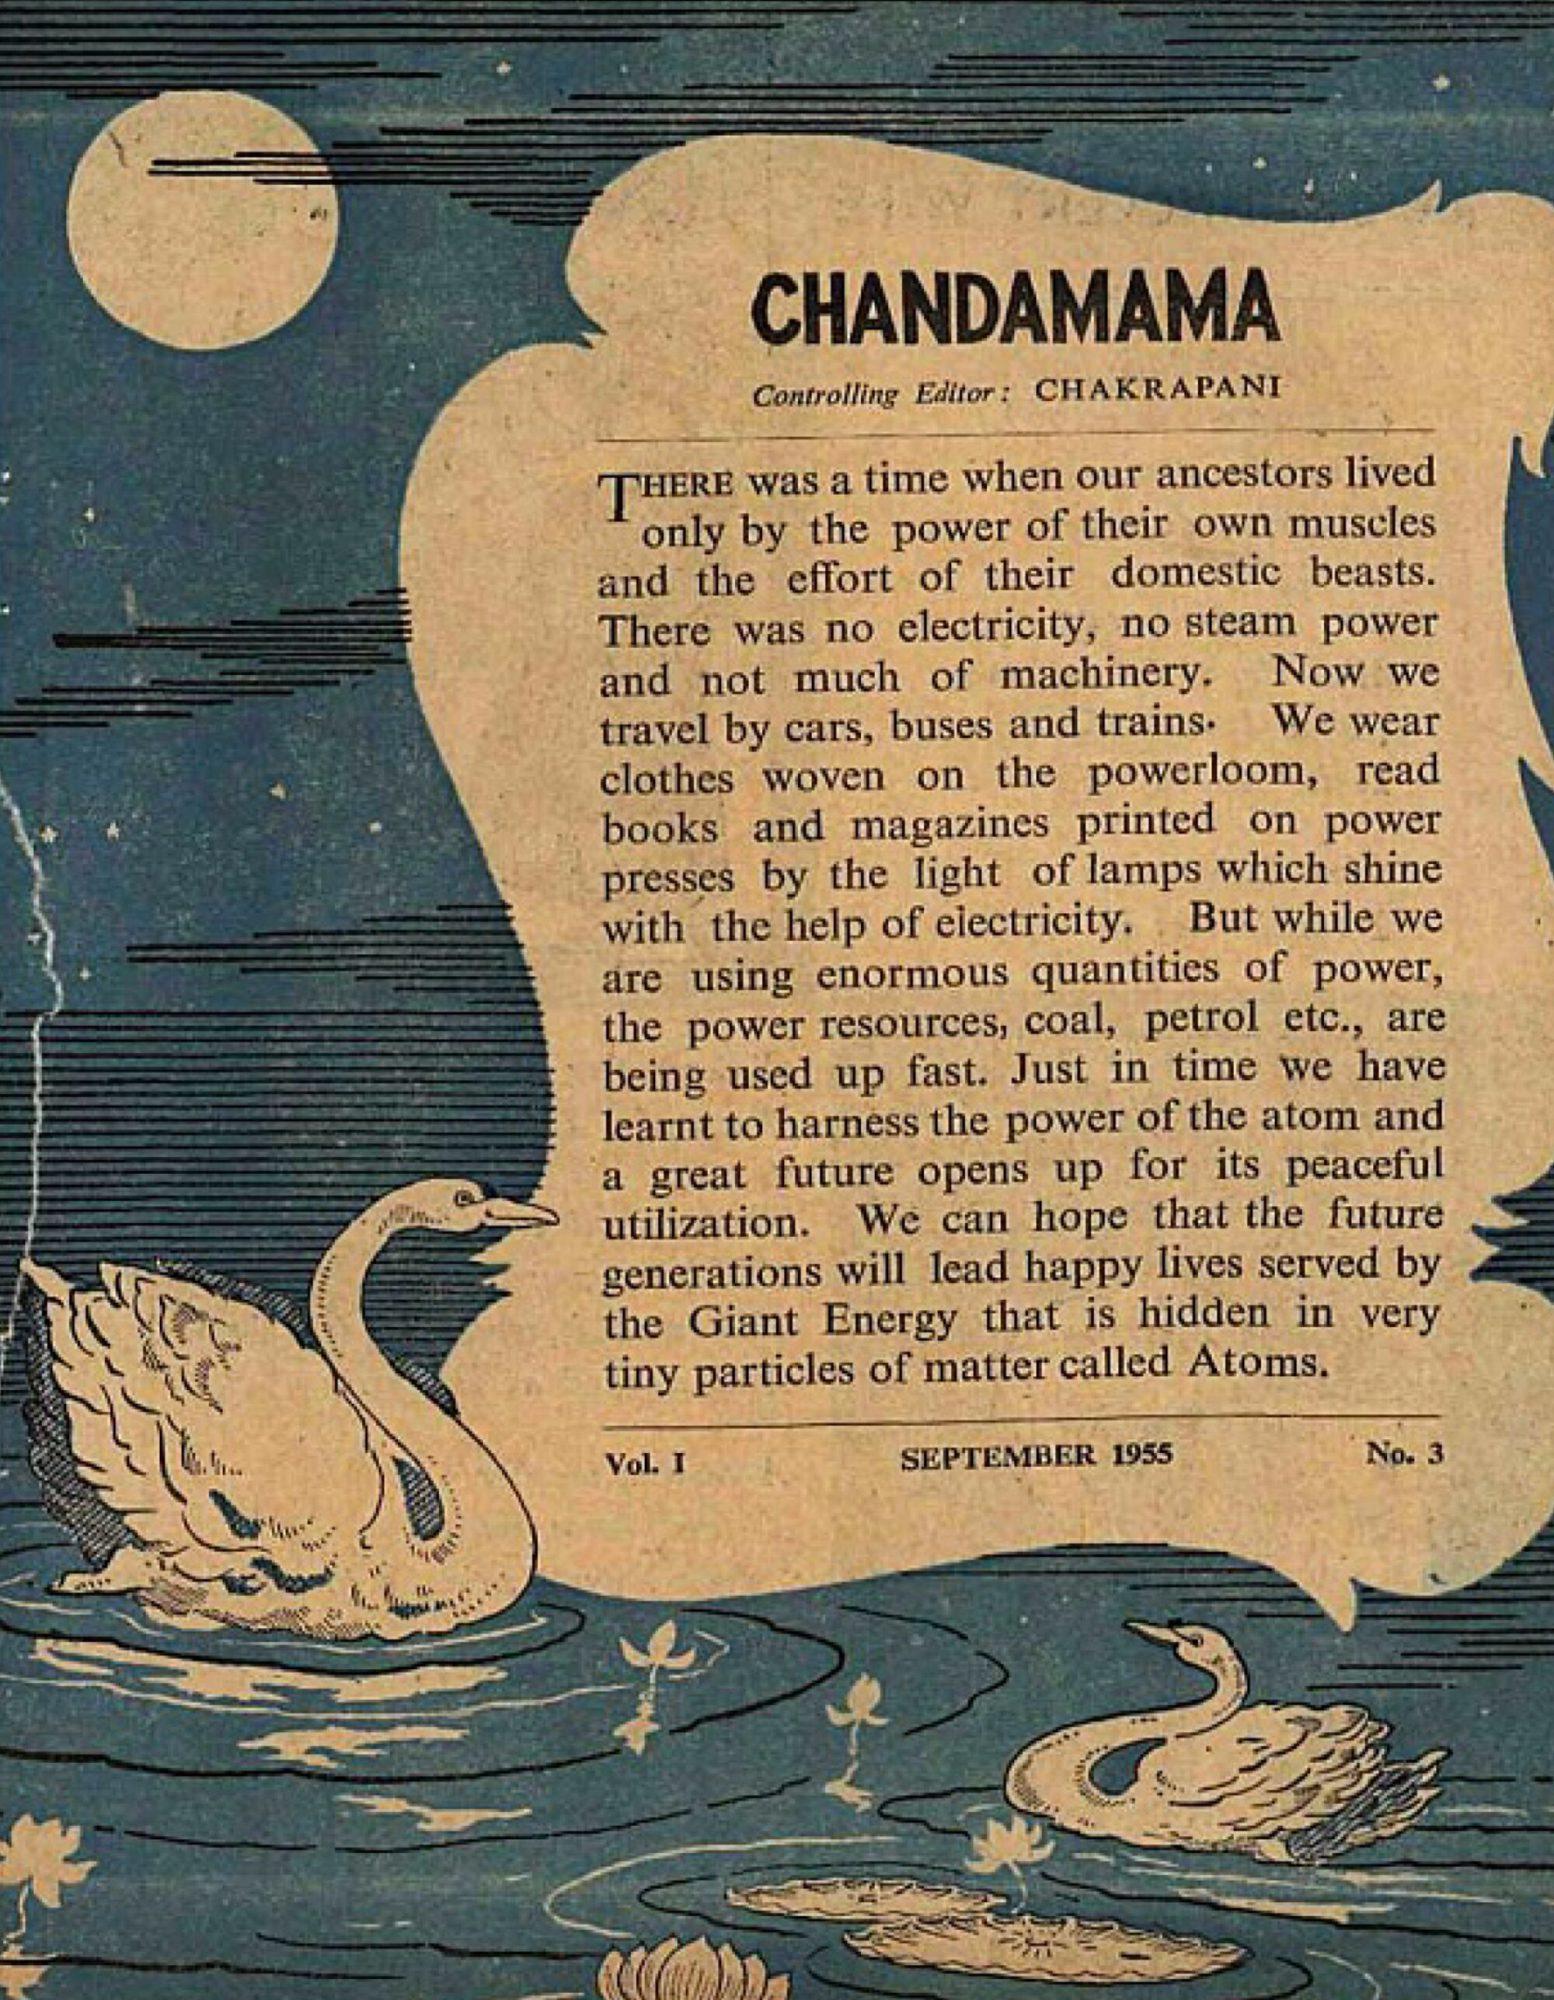 Chandamama September 1955 editorial